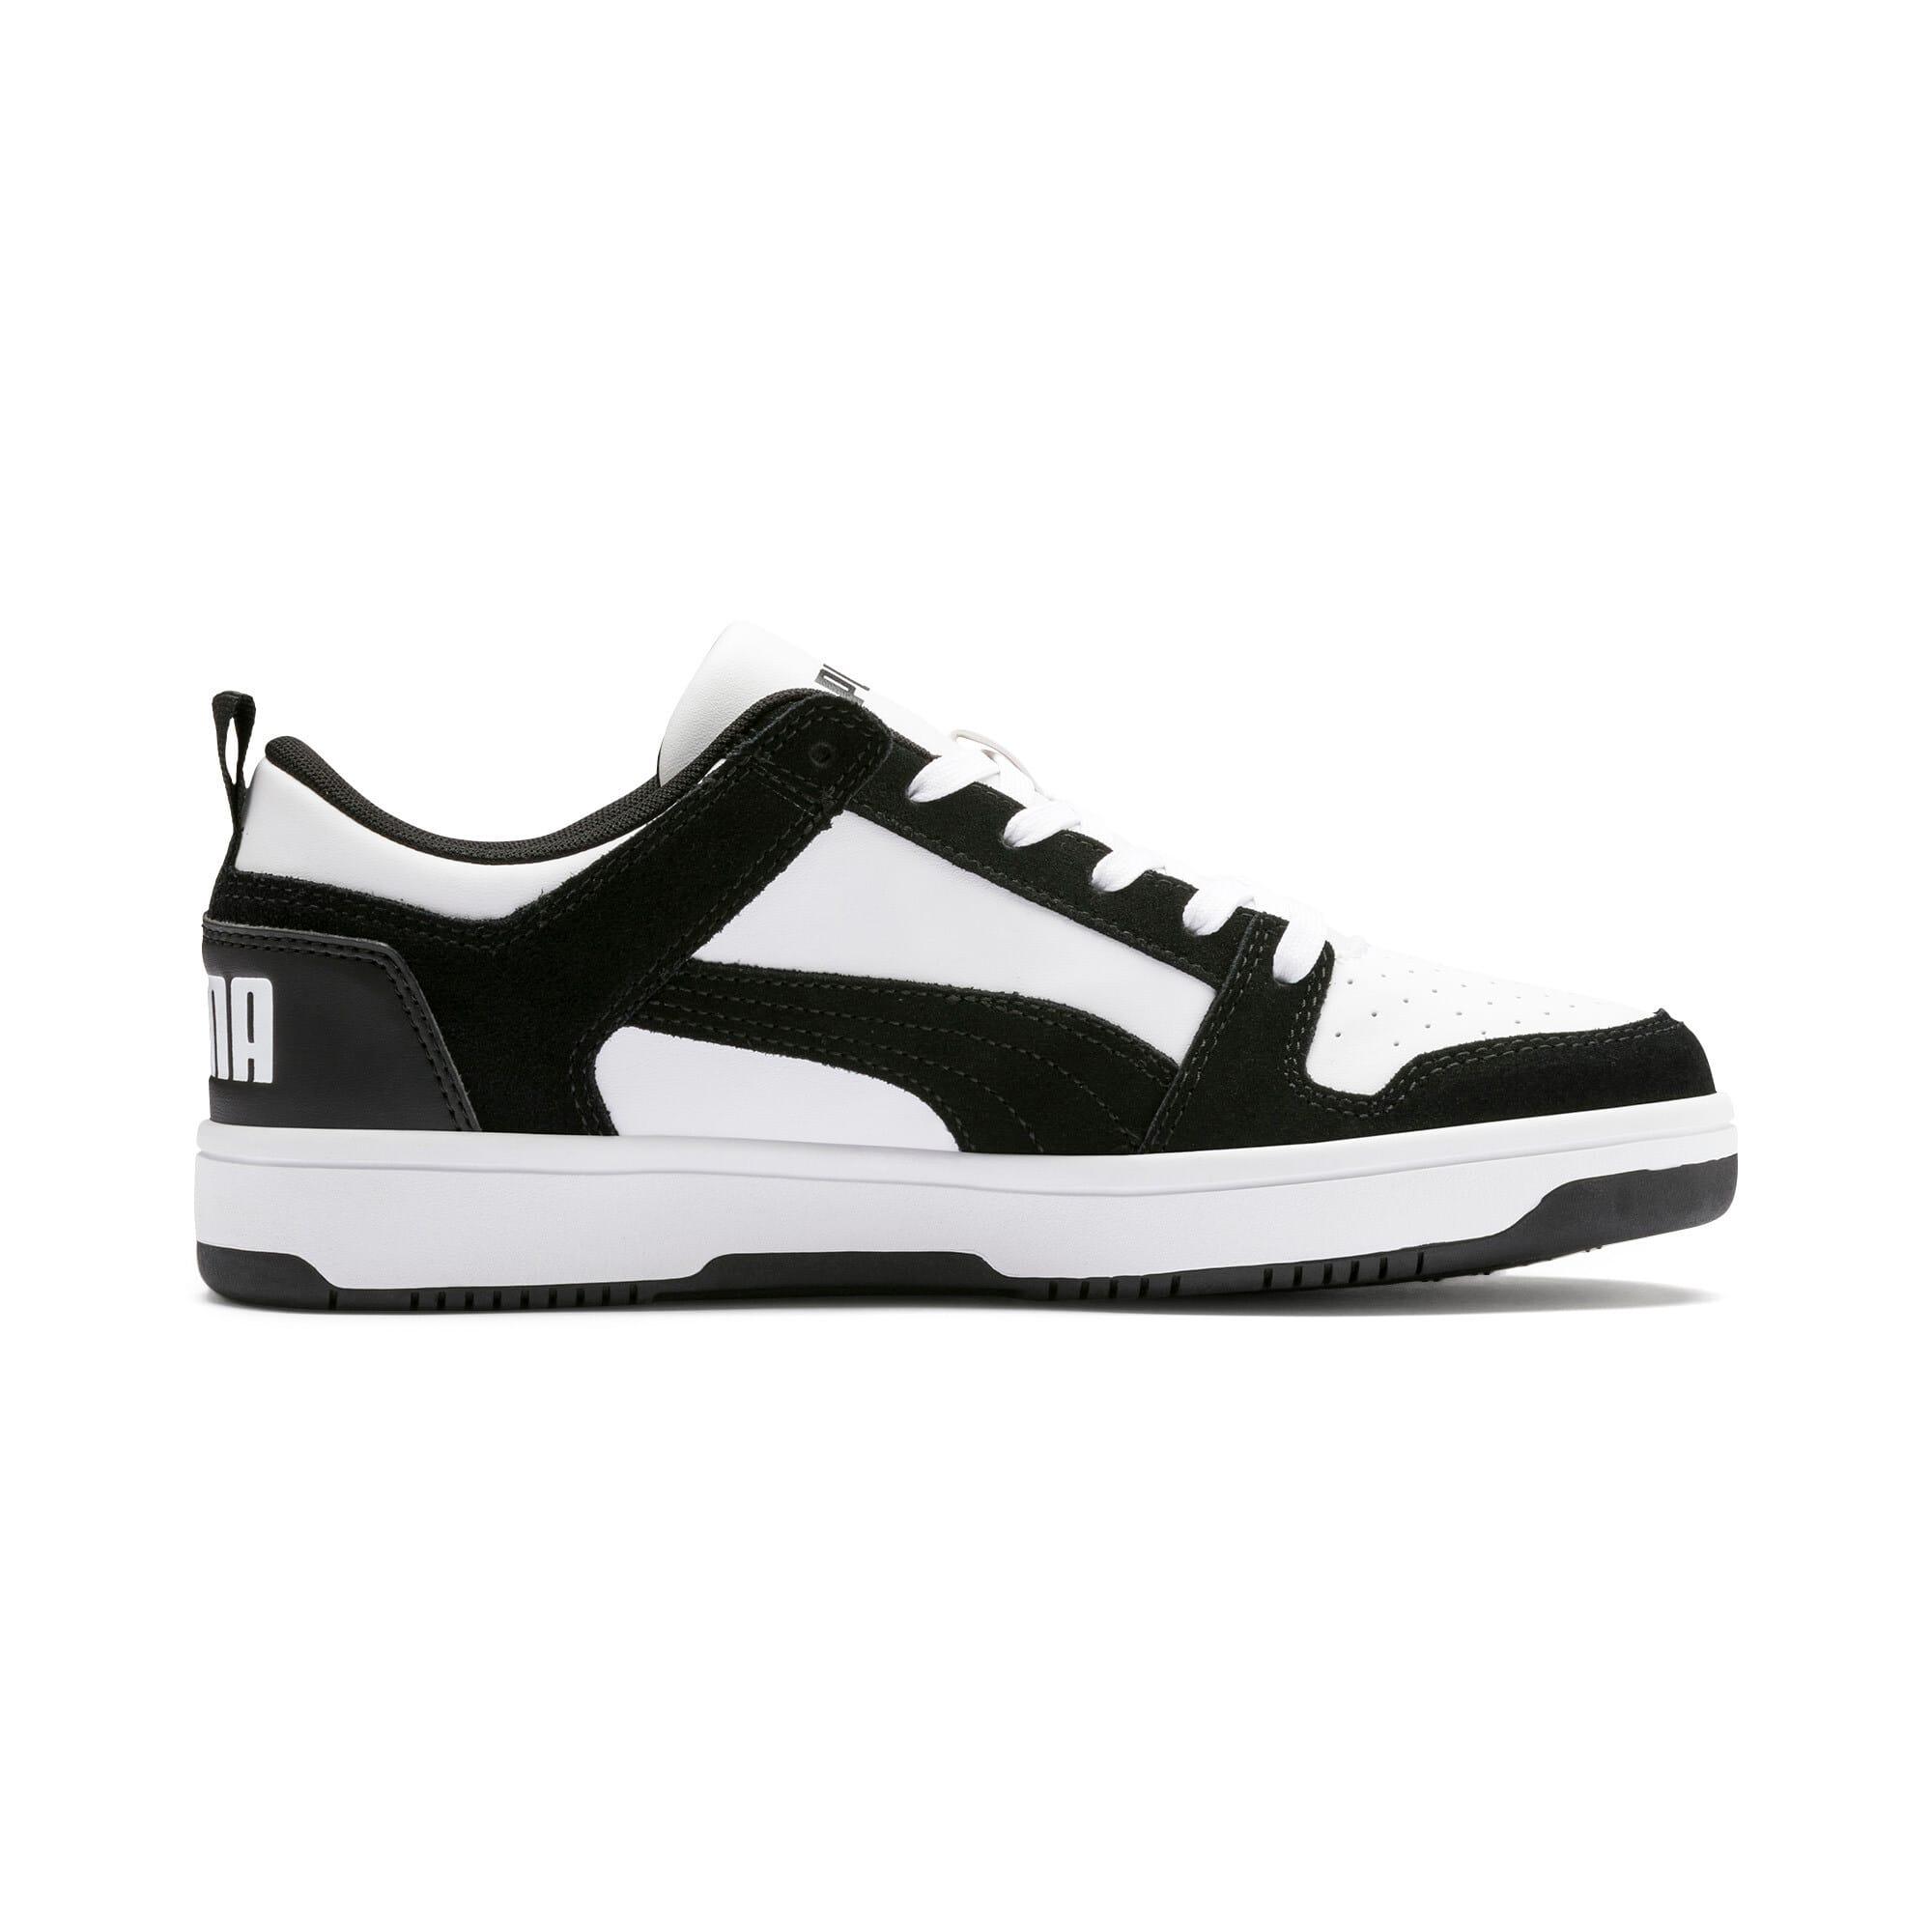 Miniatura 6 de Zapatos deportivos de gamuza PUMA Rebound LayUpLo, Puma Black-Puma White, mediano